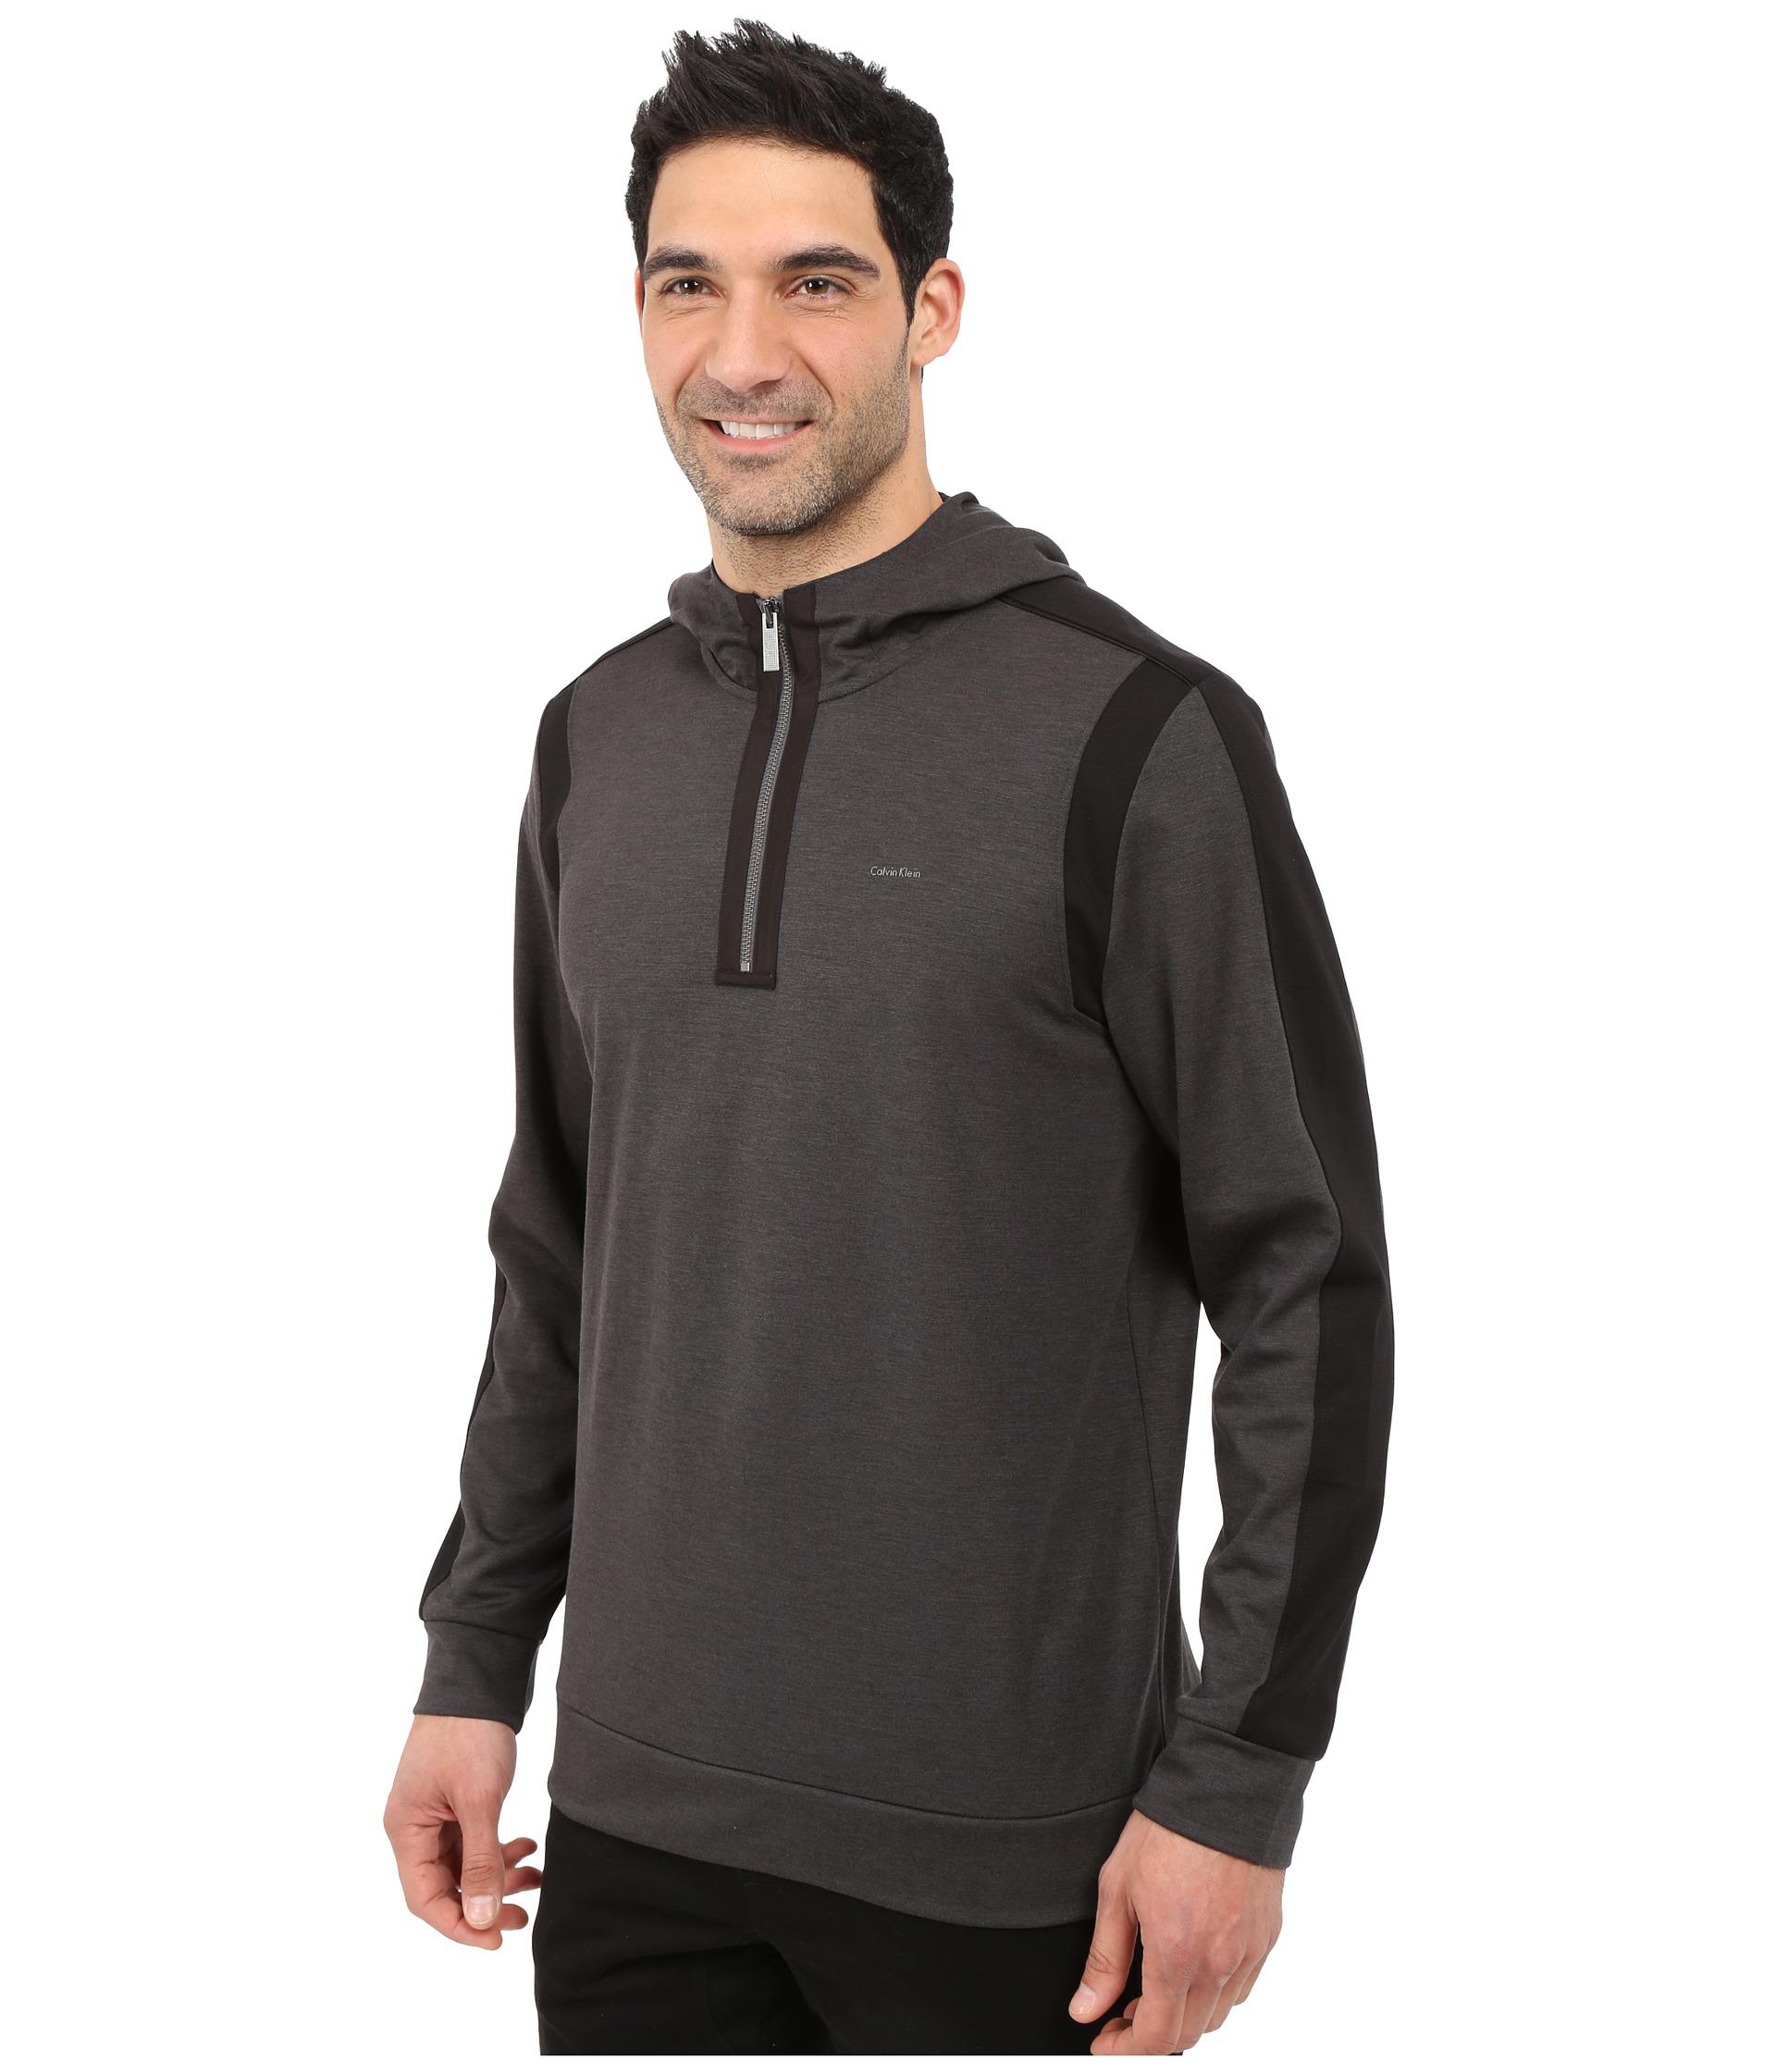 calvin klein quarter zip ponte knit hoodie sweatshirt in gray for men lyst. Black Bedroom Furniture Sets. Home Design Ideas